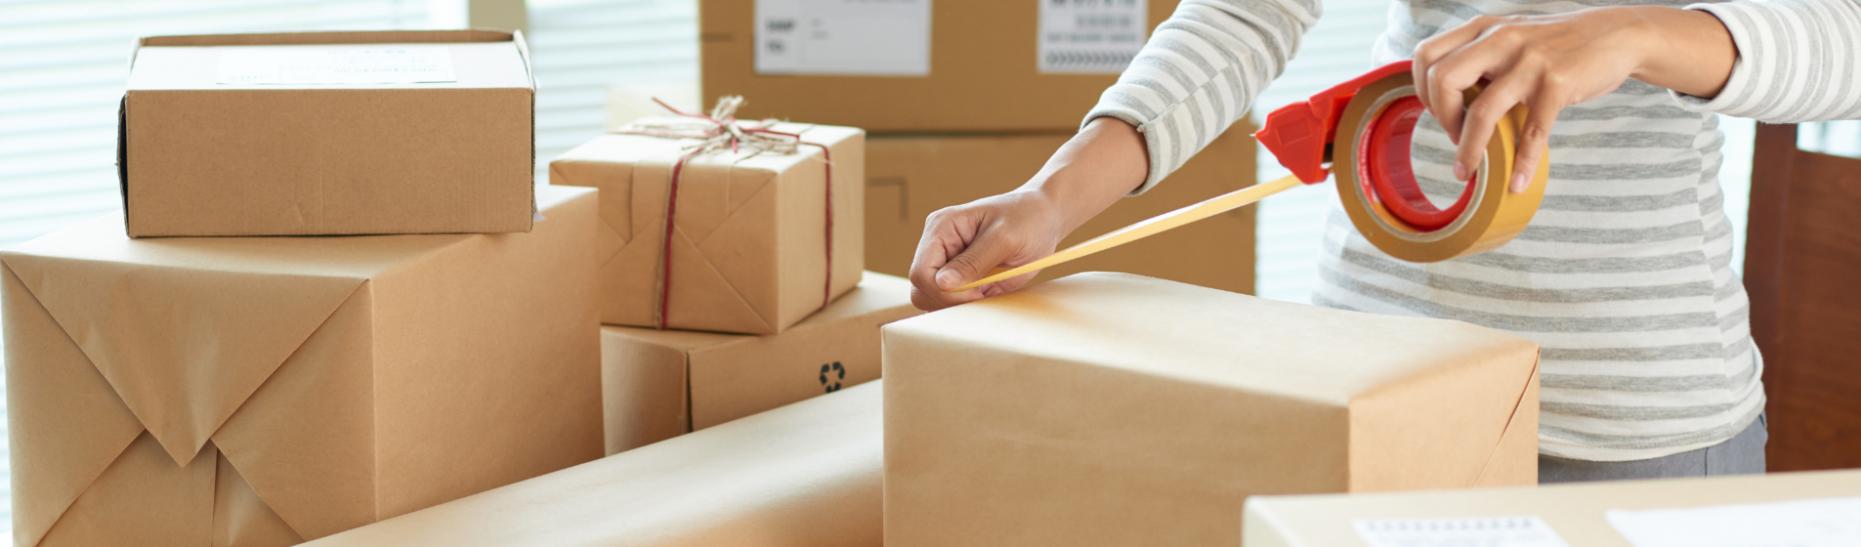 Taping shipping carton